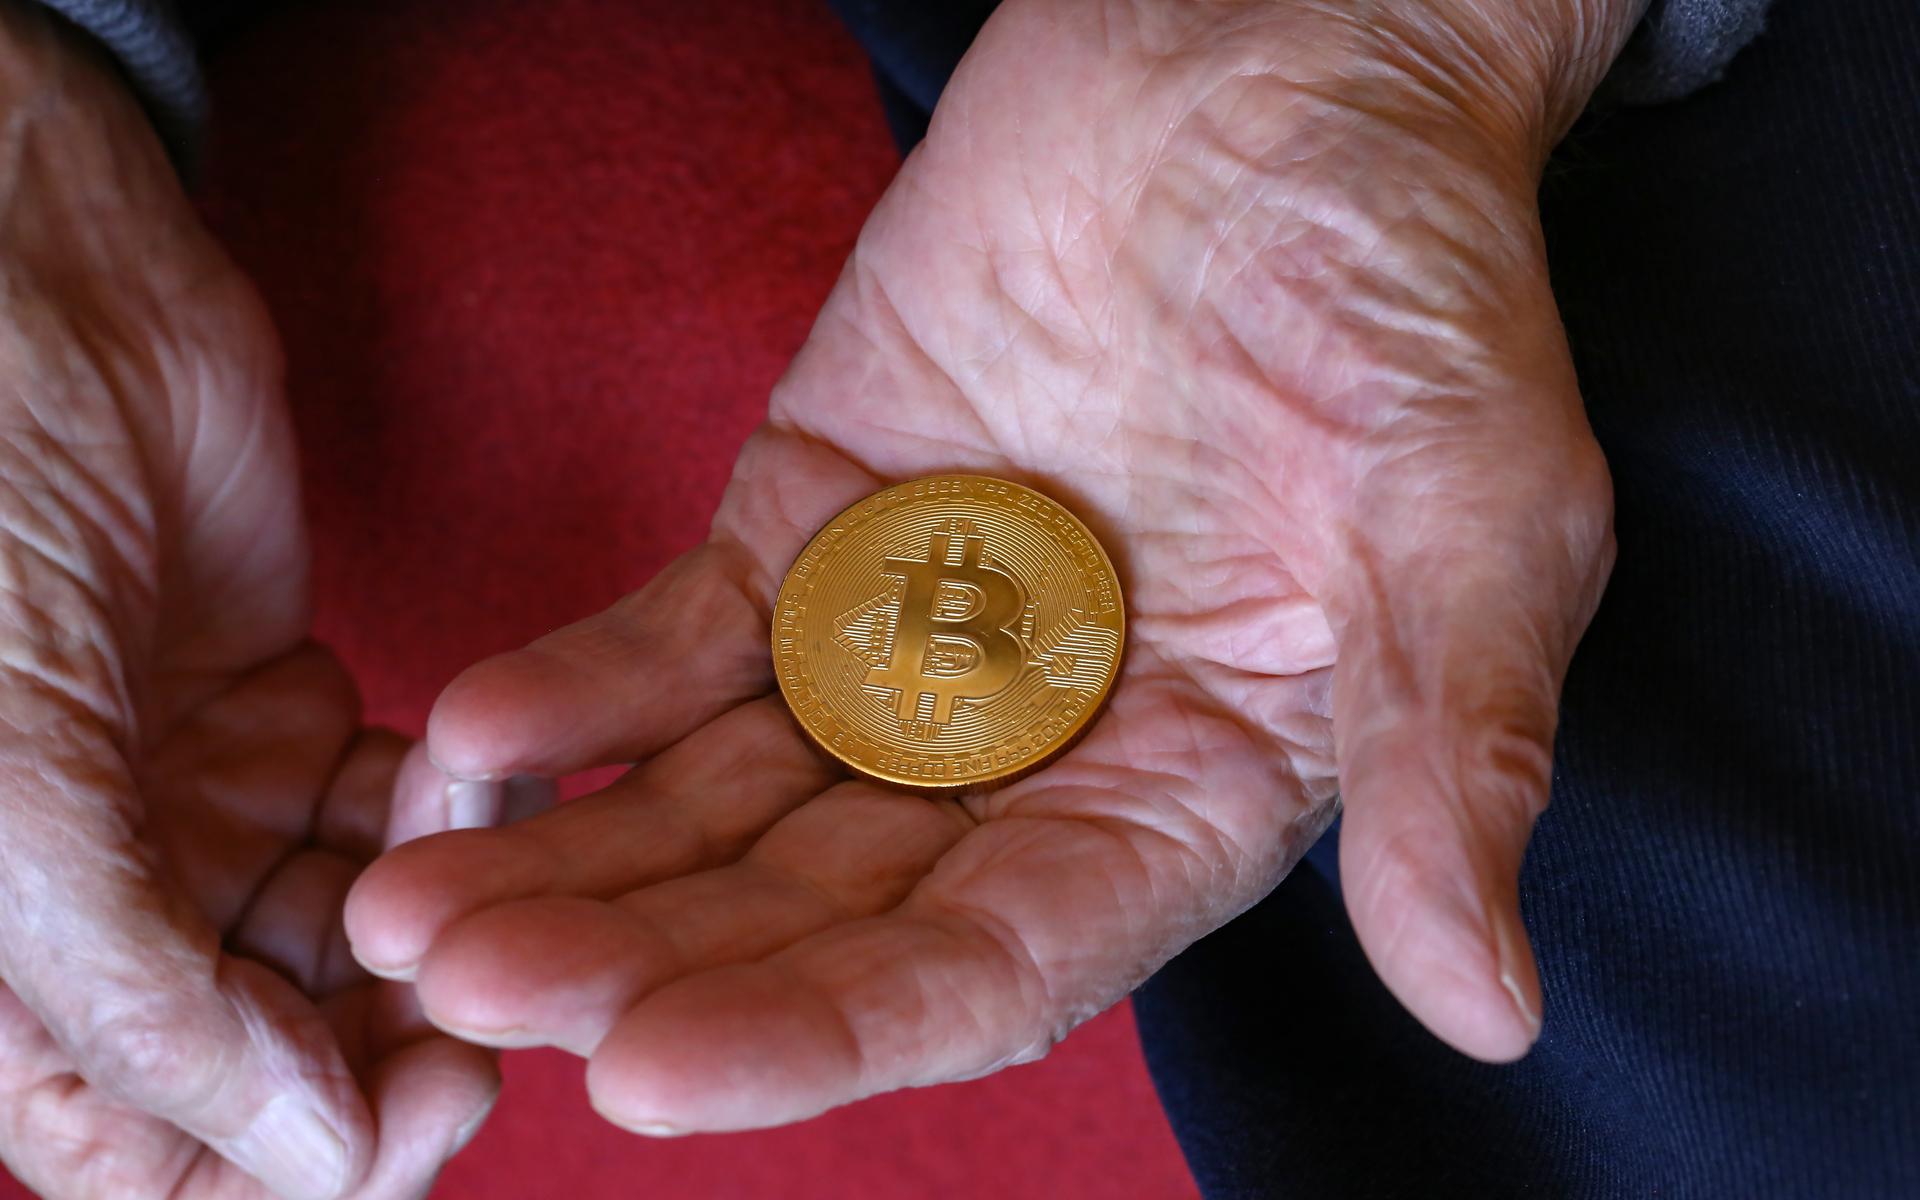 Bitcoin IRA pension product to hit $1 Billion Soon